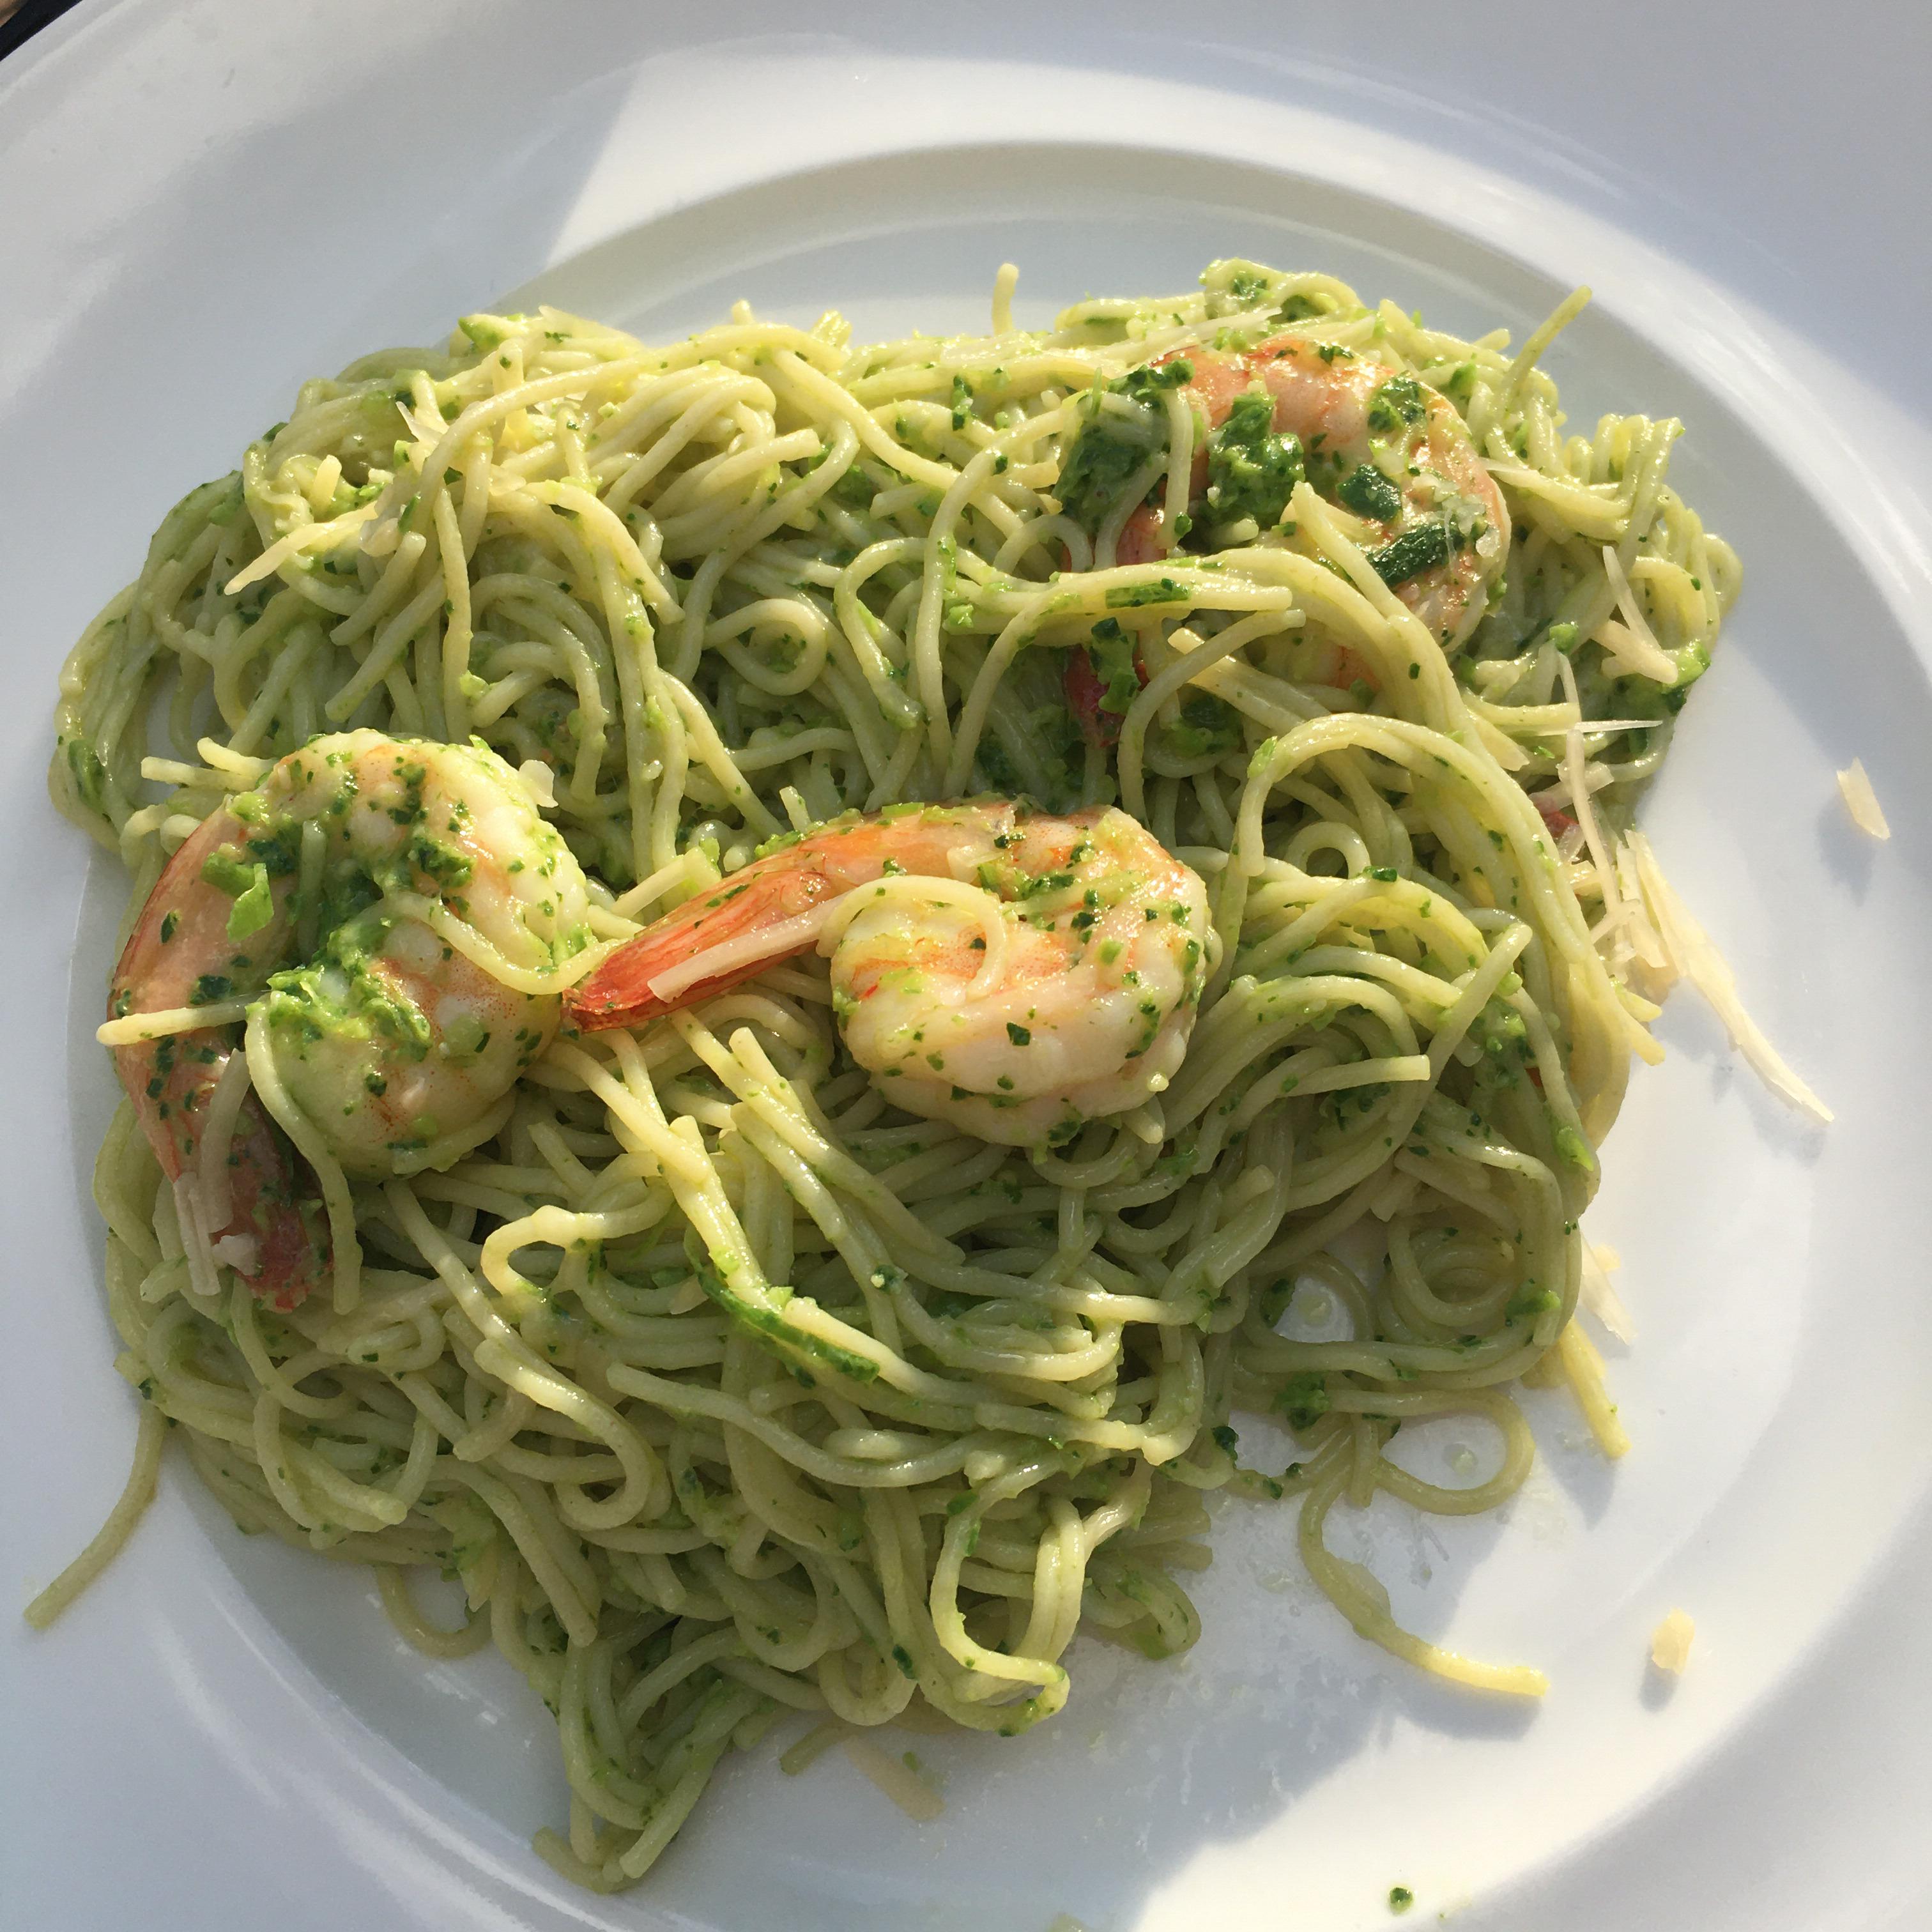 Spinach and Garlic Scape Pesto Rose Althoff